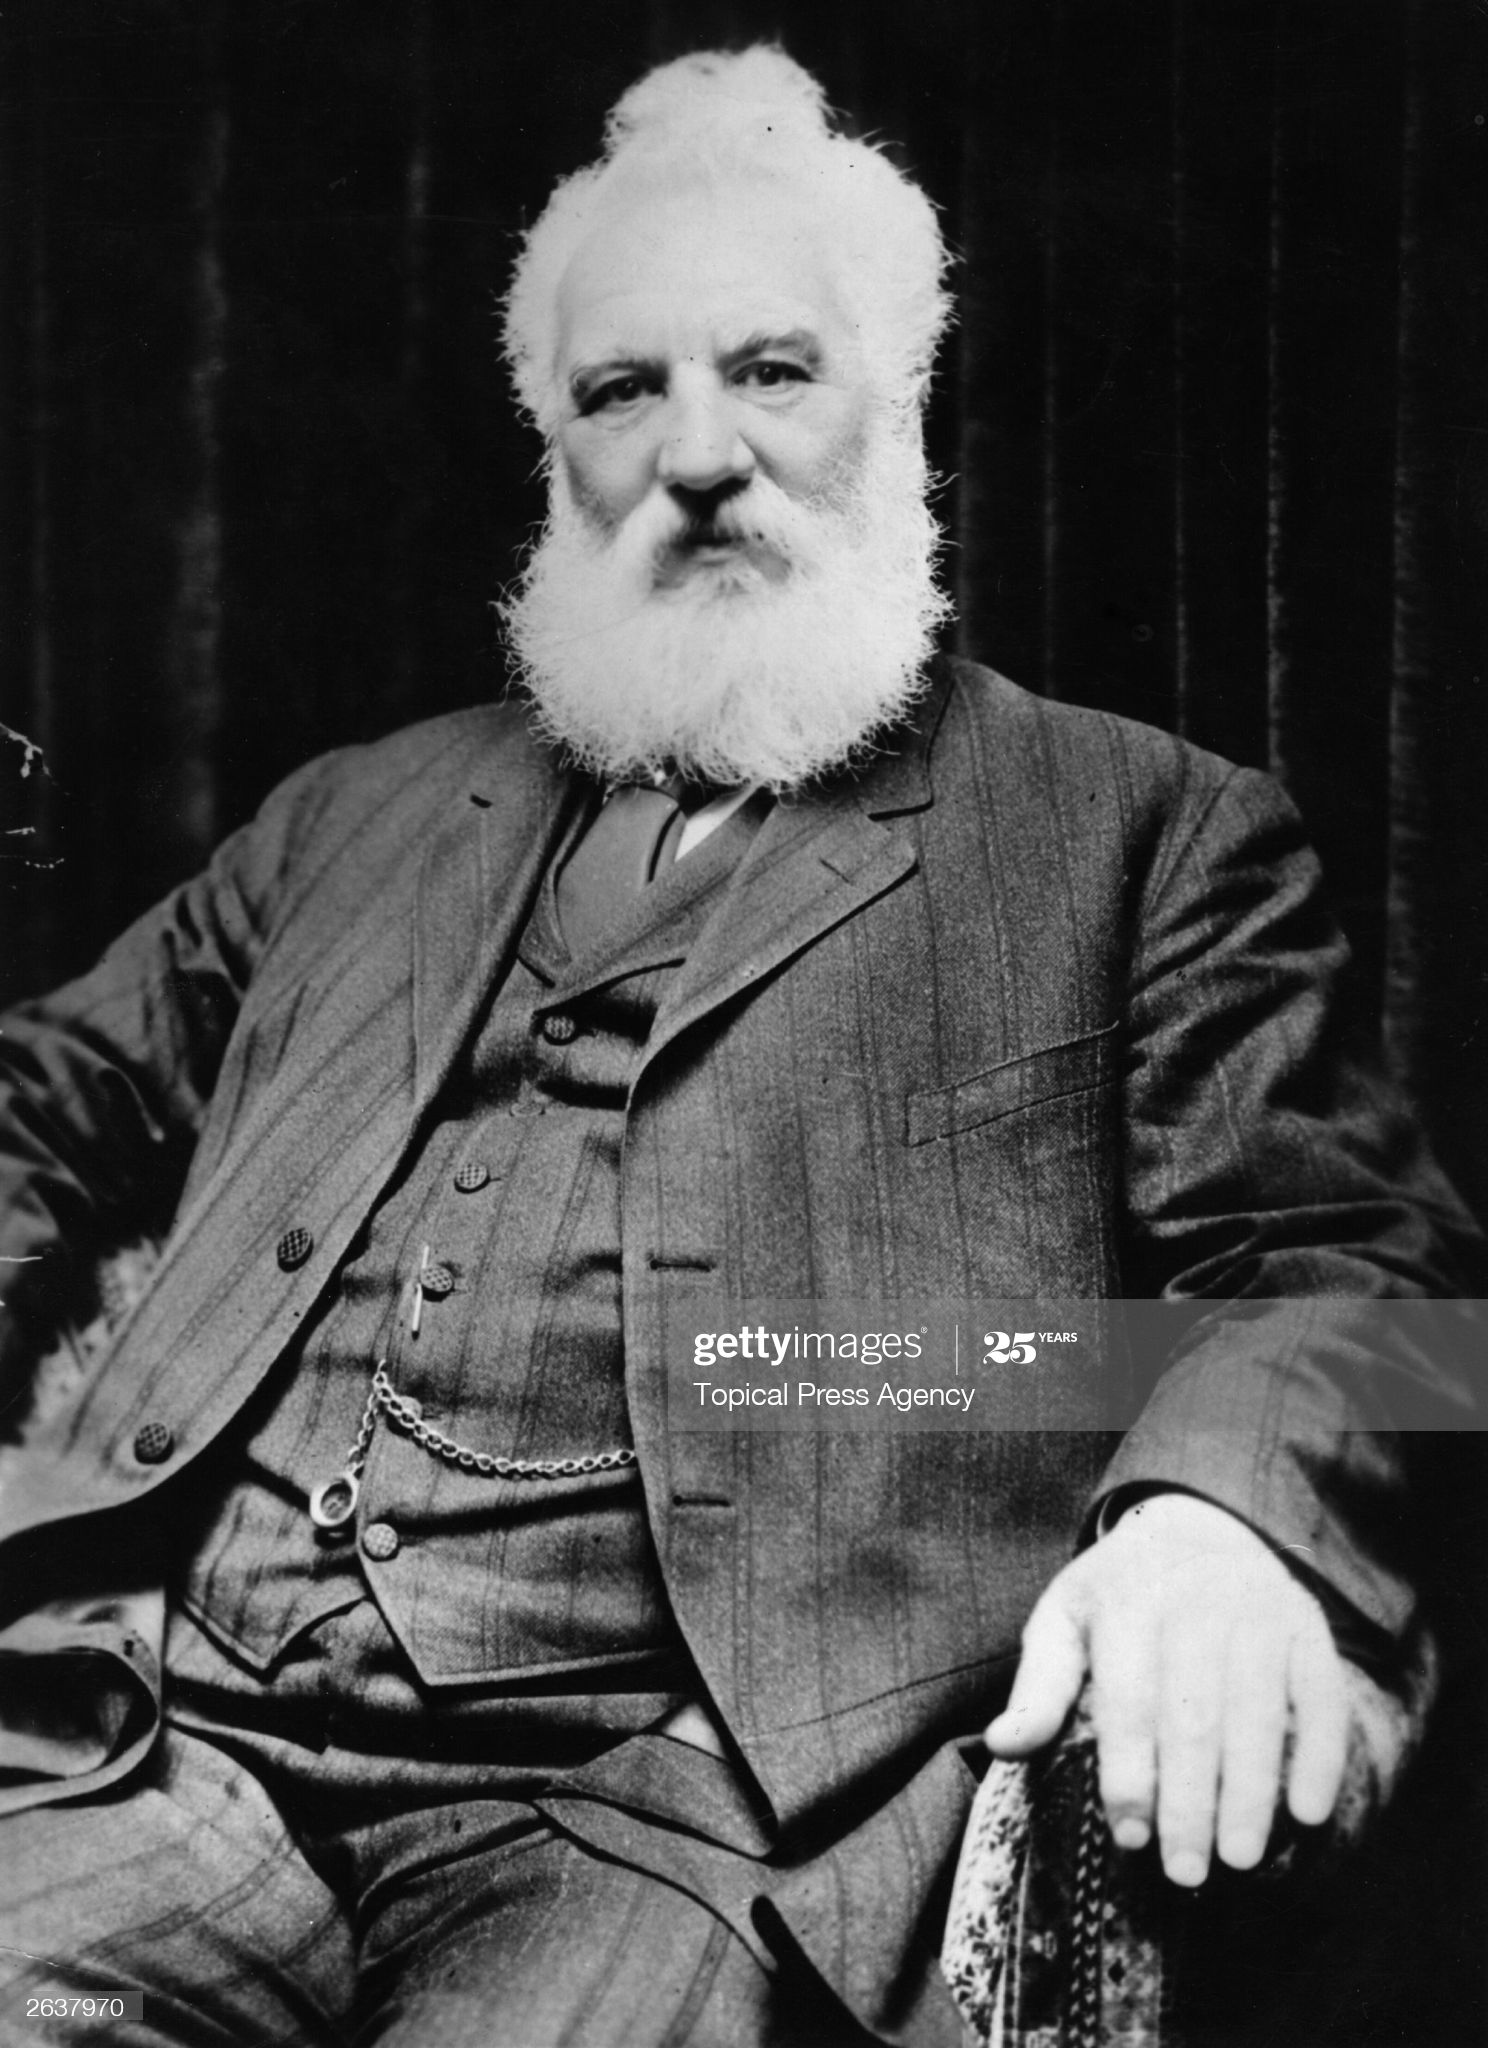 News Photo Scottish Inventor Alexander Graham Bell Who